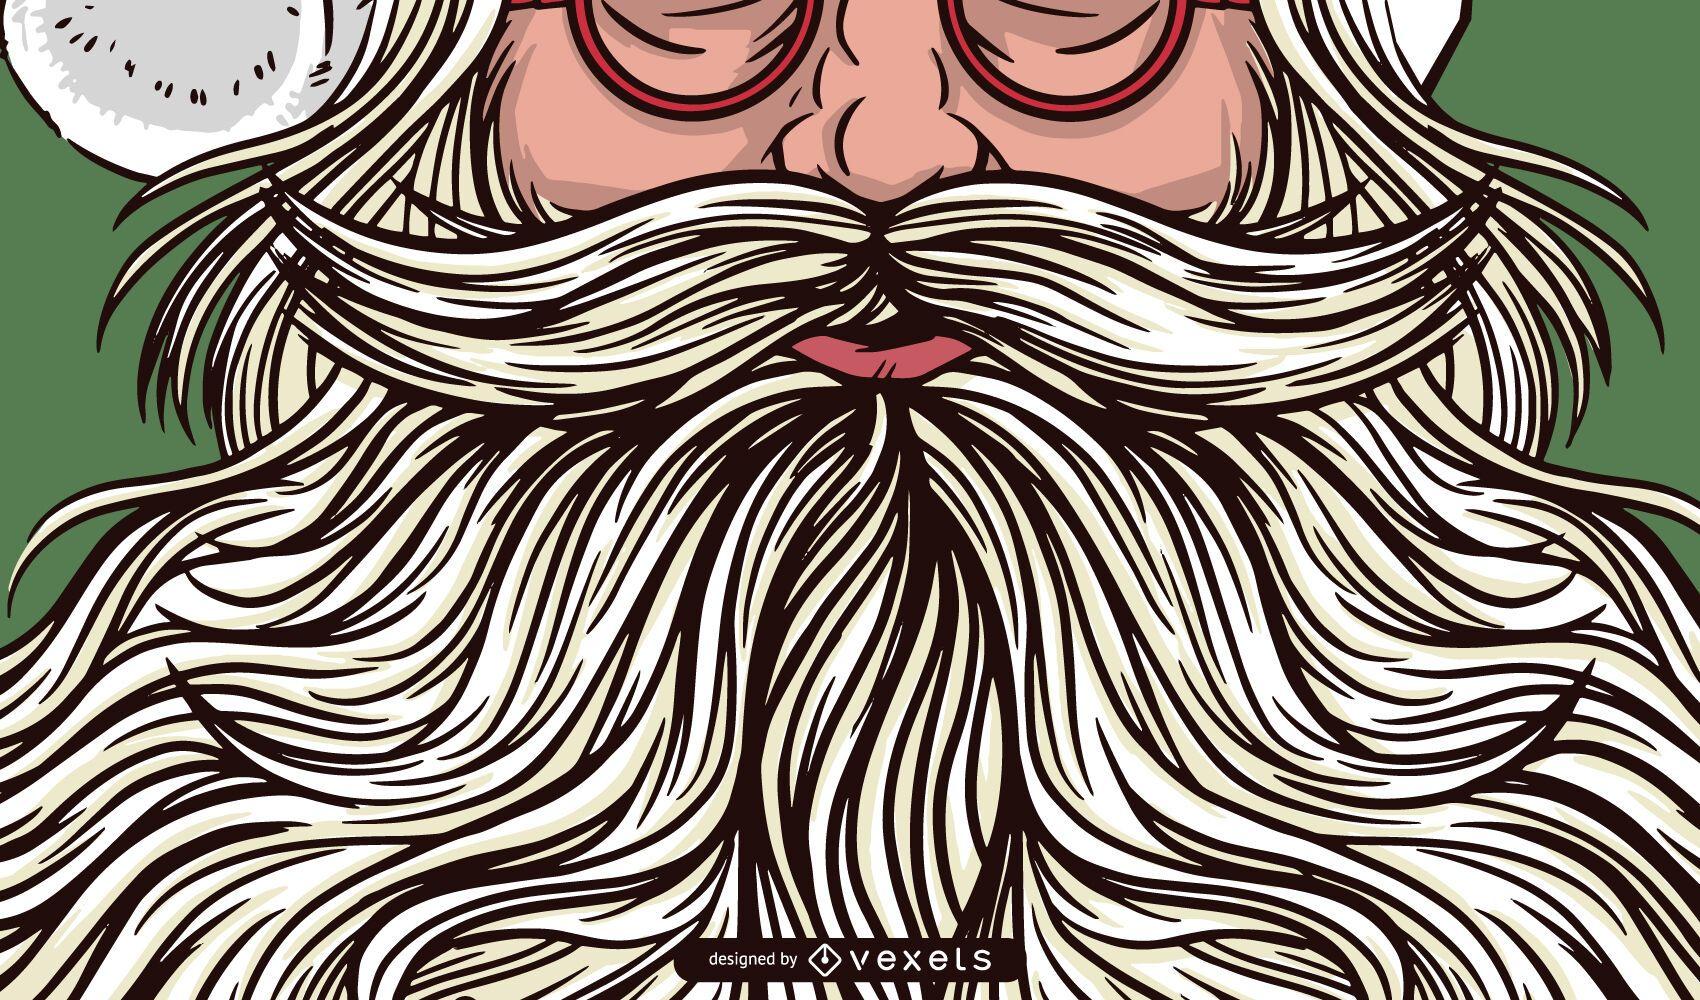 Santa beard illustration design